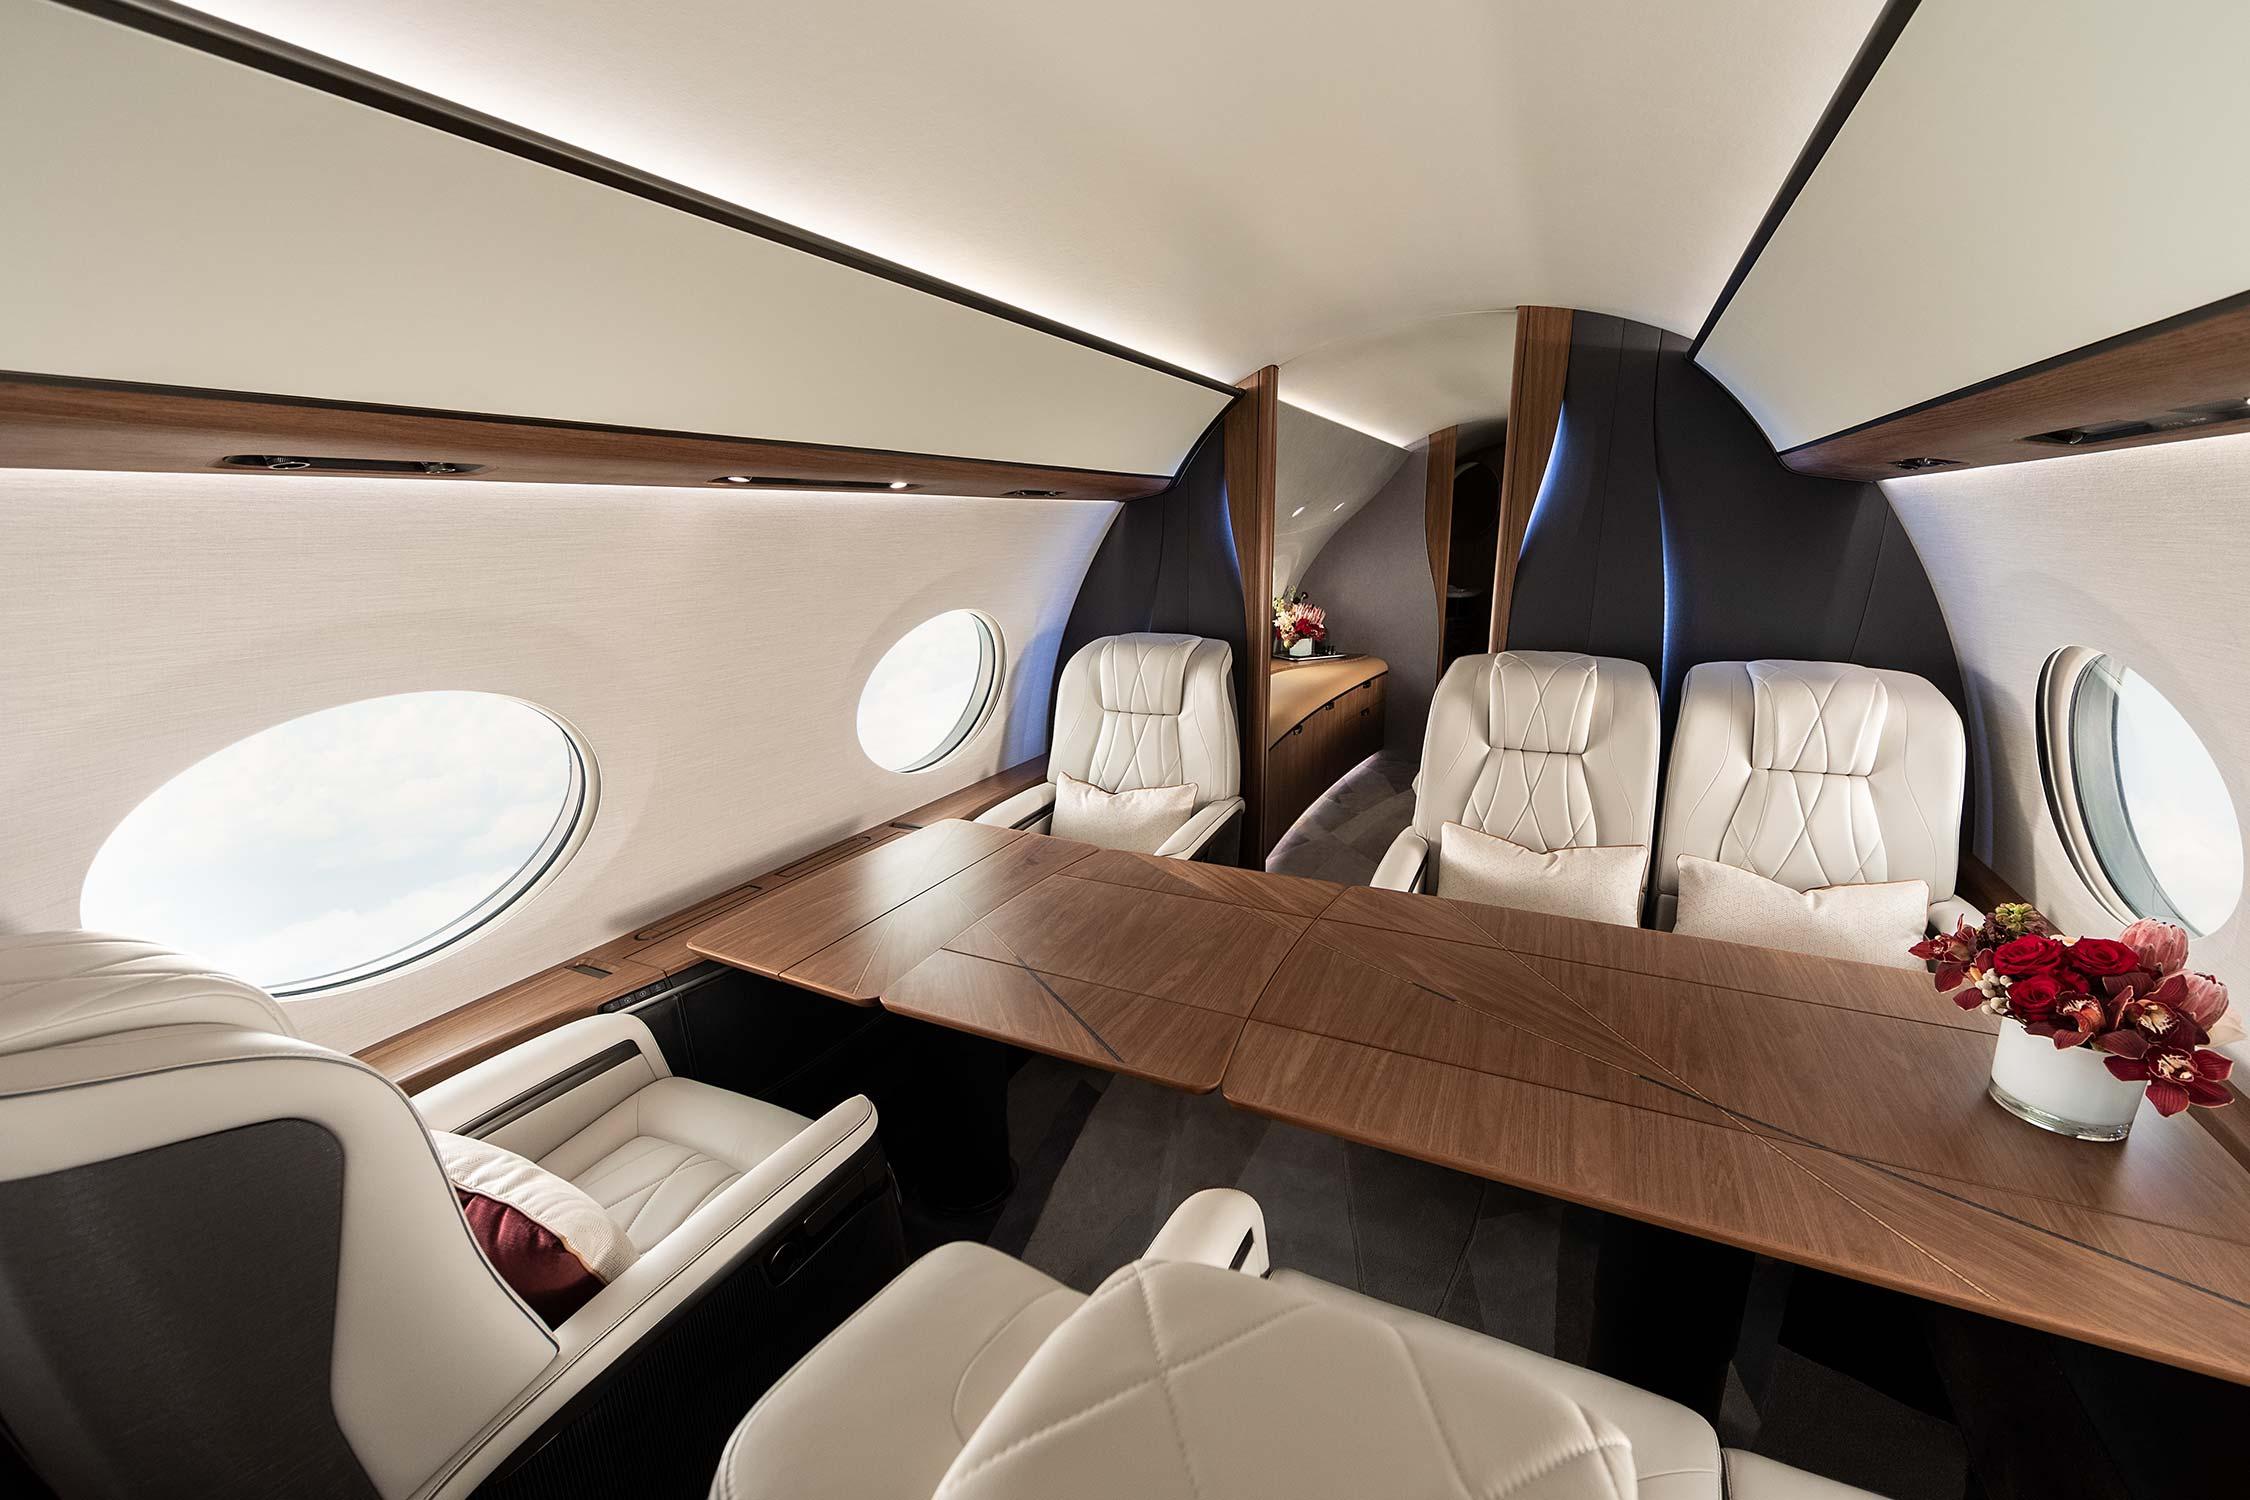 Gulfstream private jet charter Gulfstream business jet Gulfstream corporate jet Gulfstream charter4 - Gulfstream private jet builder Gulfstream private charter and Gulfstream jet broker